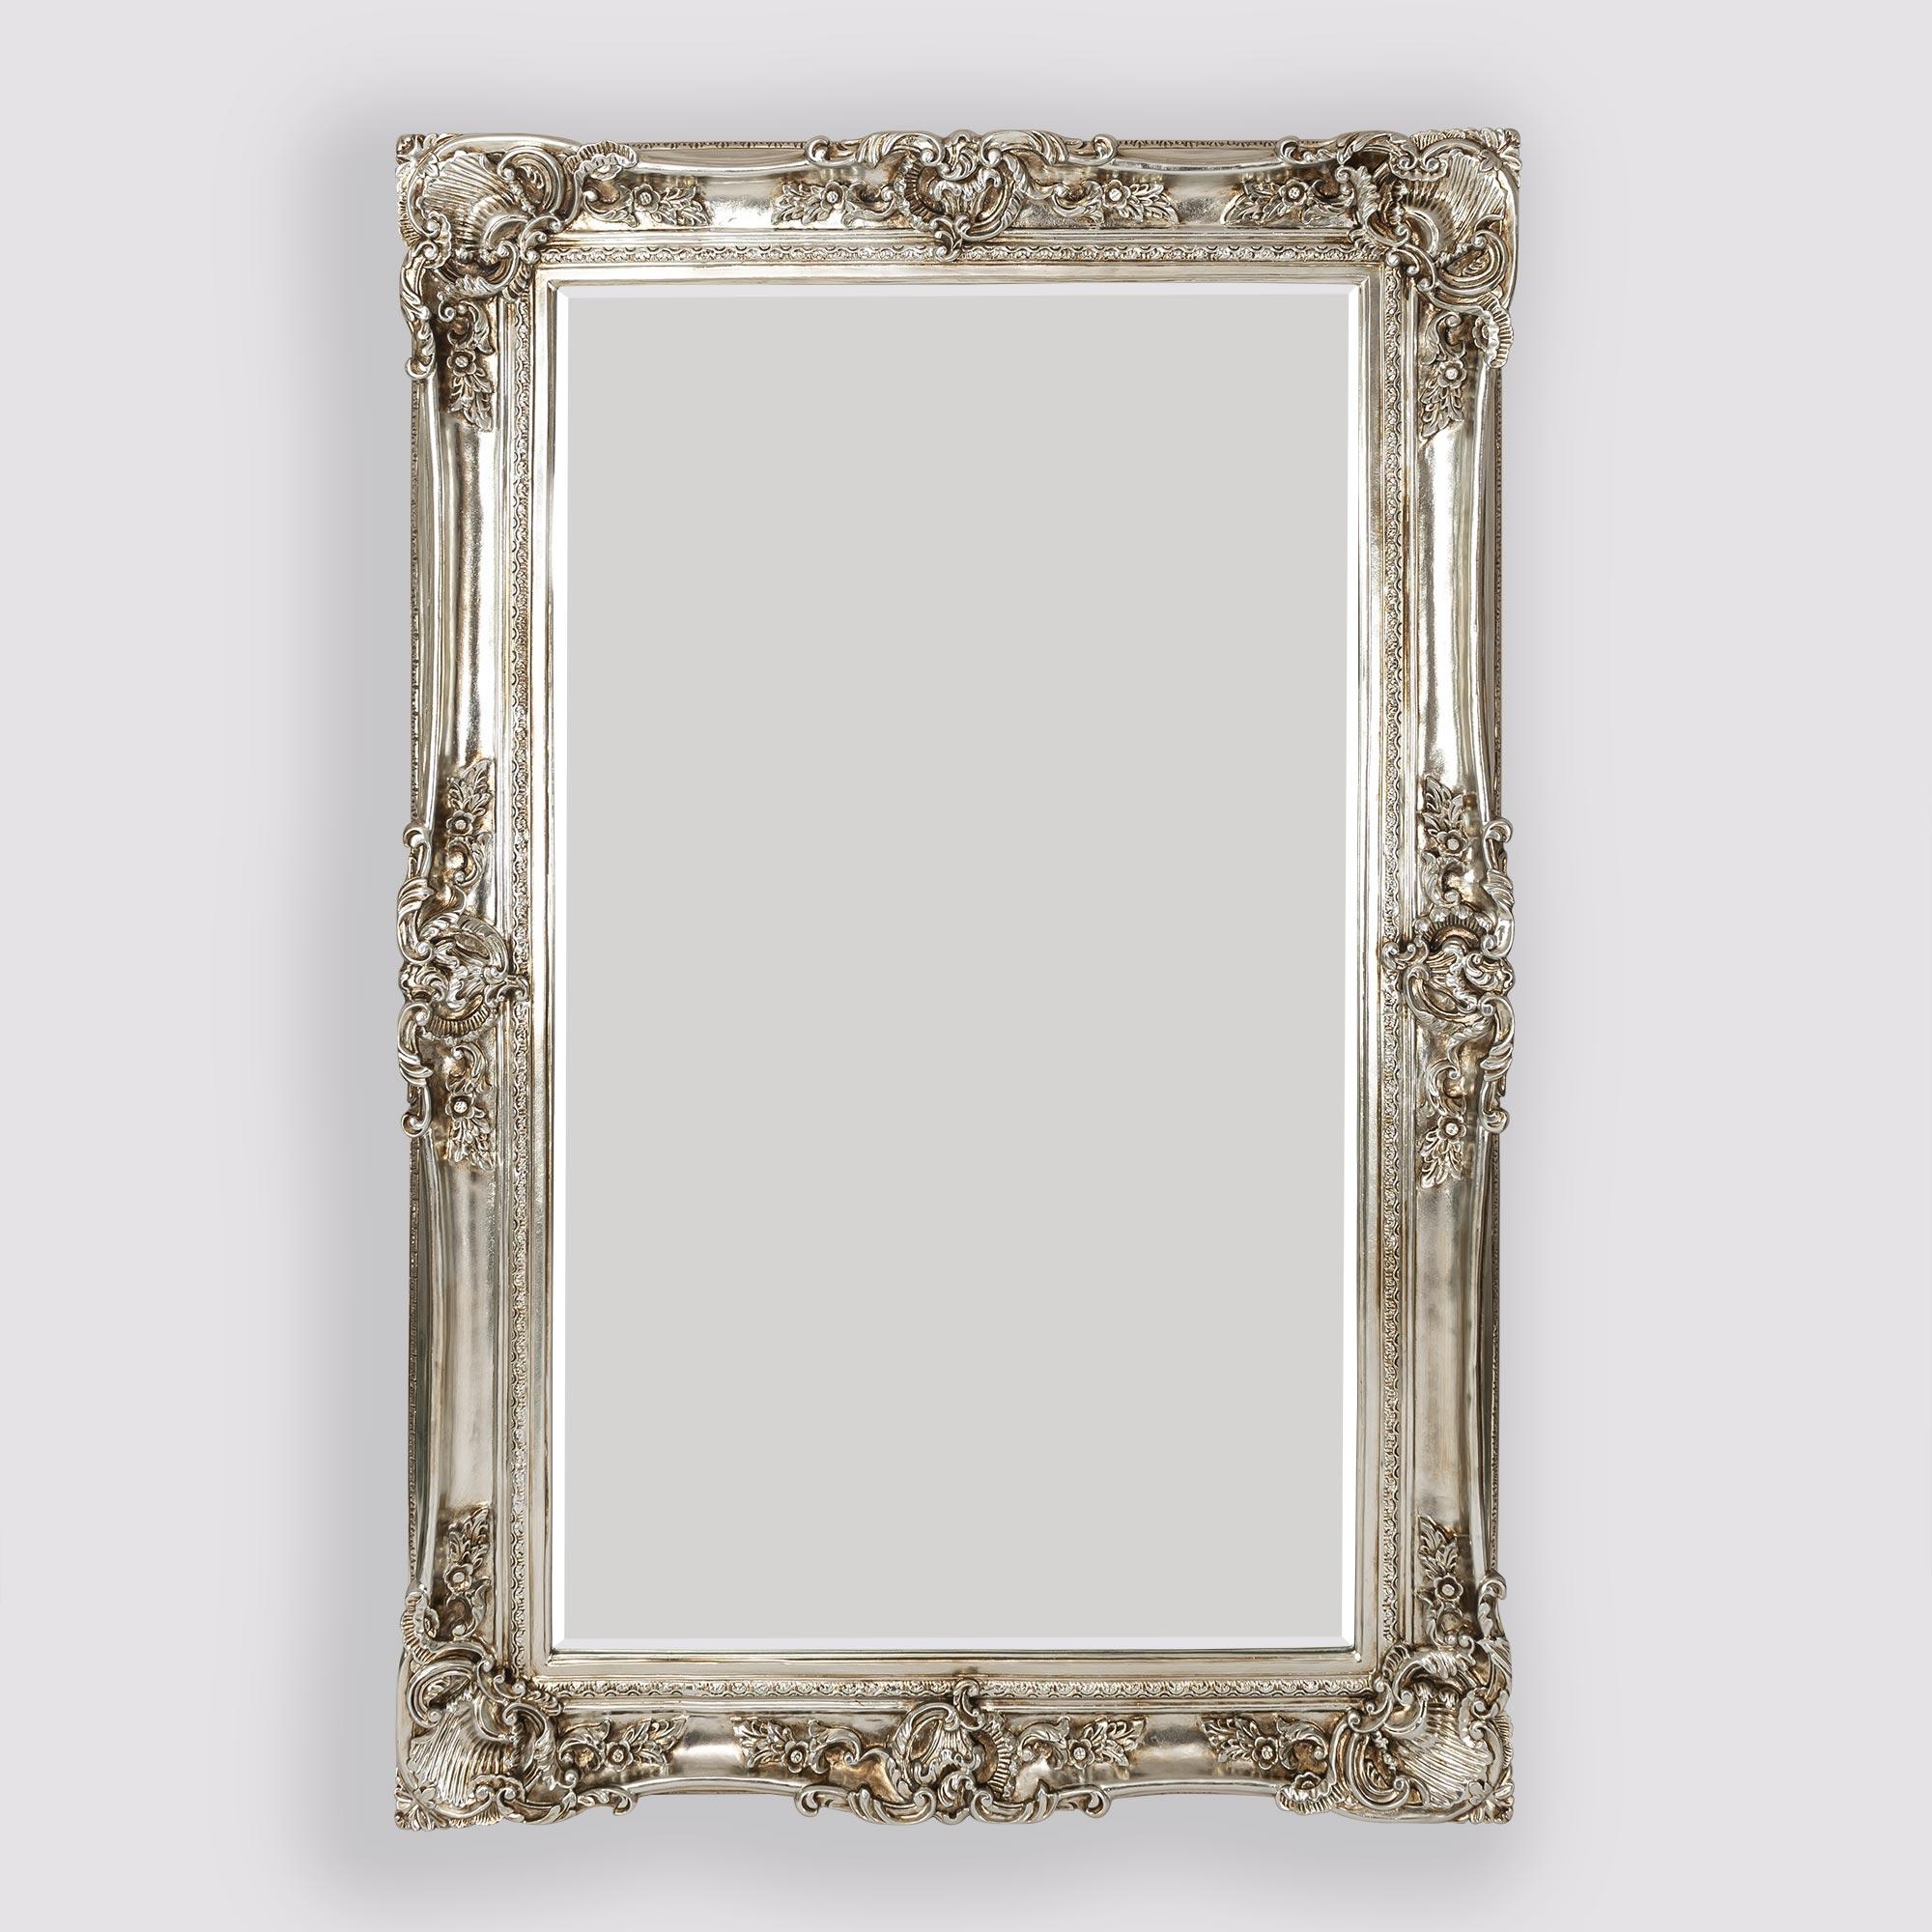 Leonardo Antique Style Silver Large Floor Standing Decorative Wall Mirror